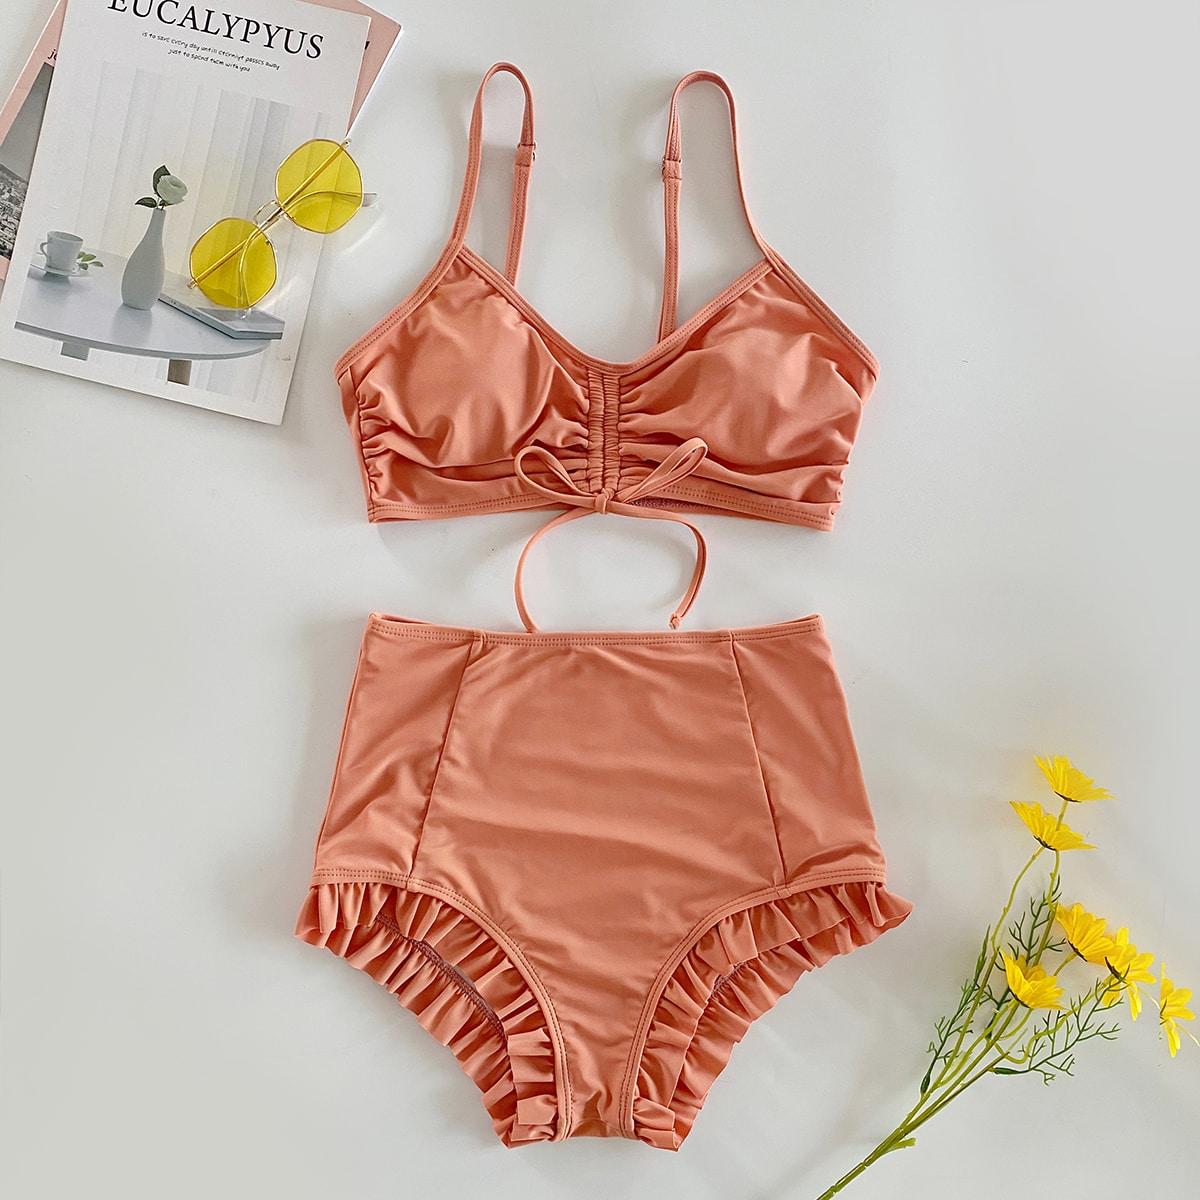 Ruched Drawstring Frill Trim Bikini Swimsuit